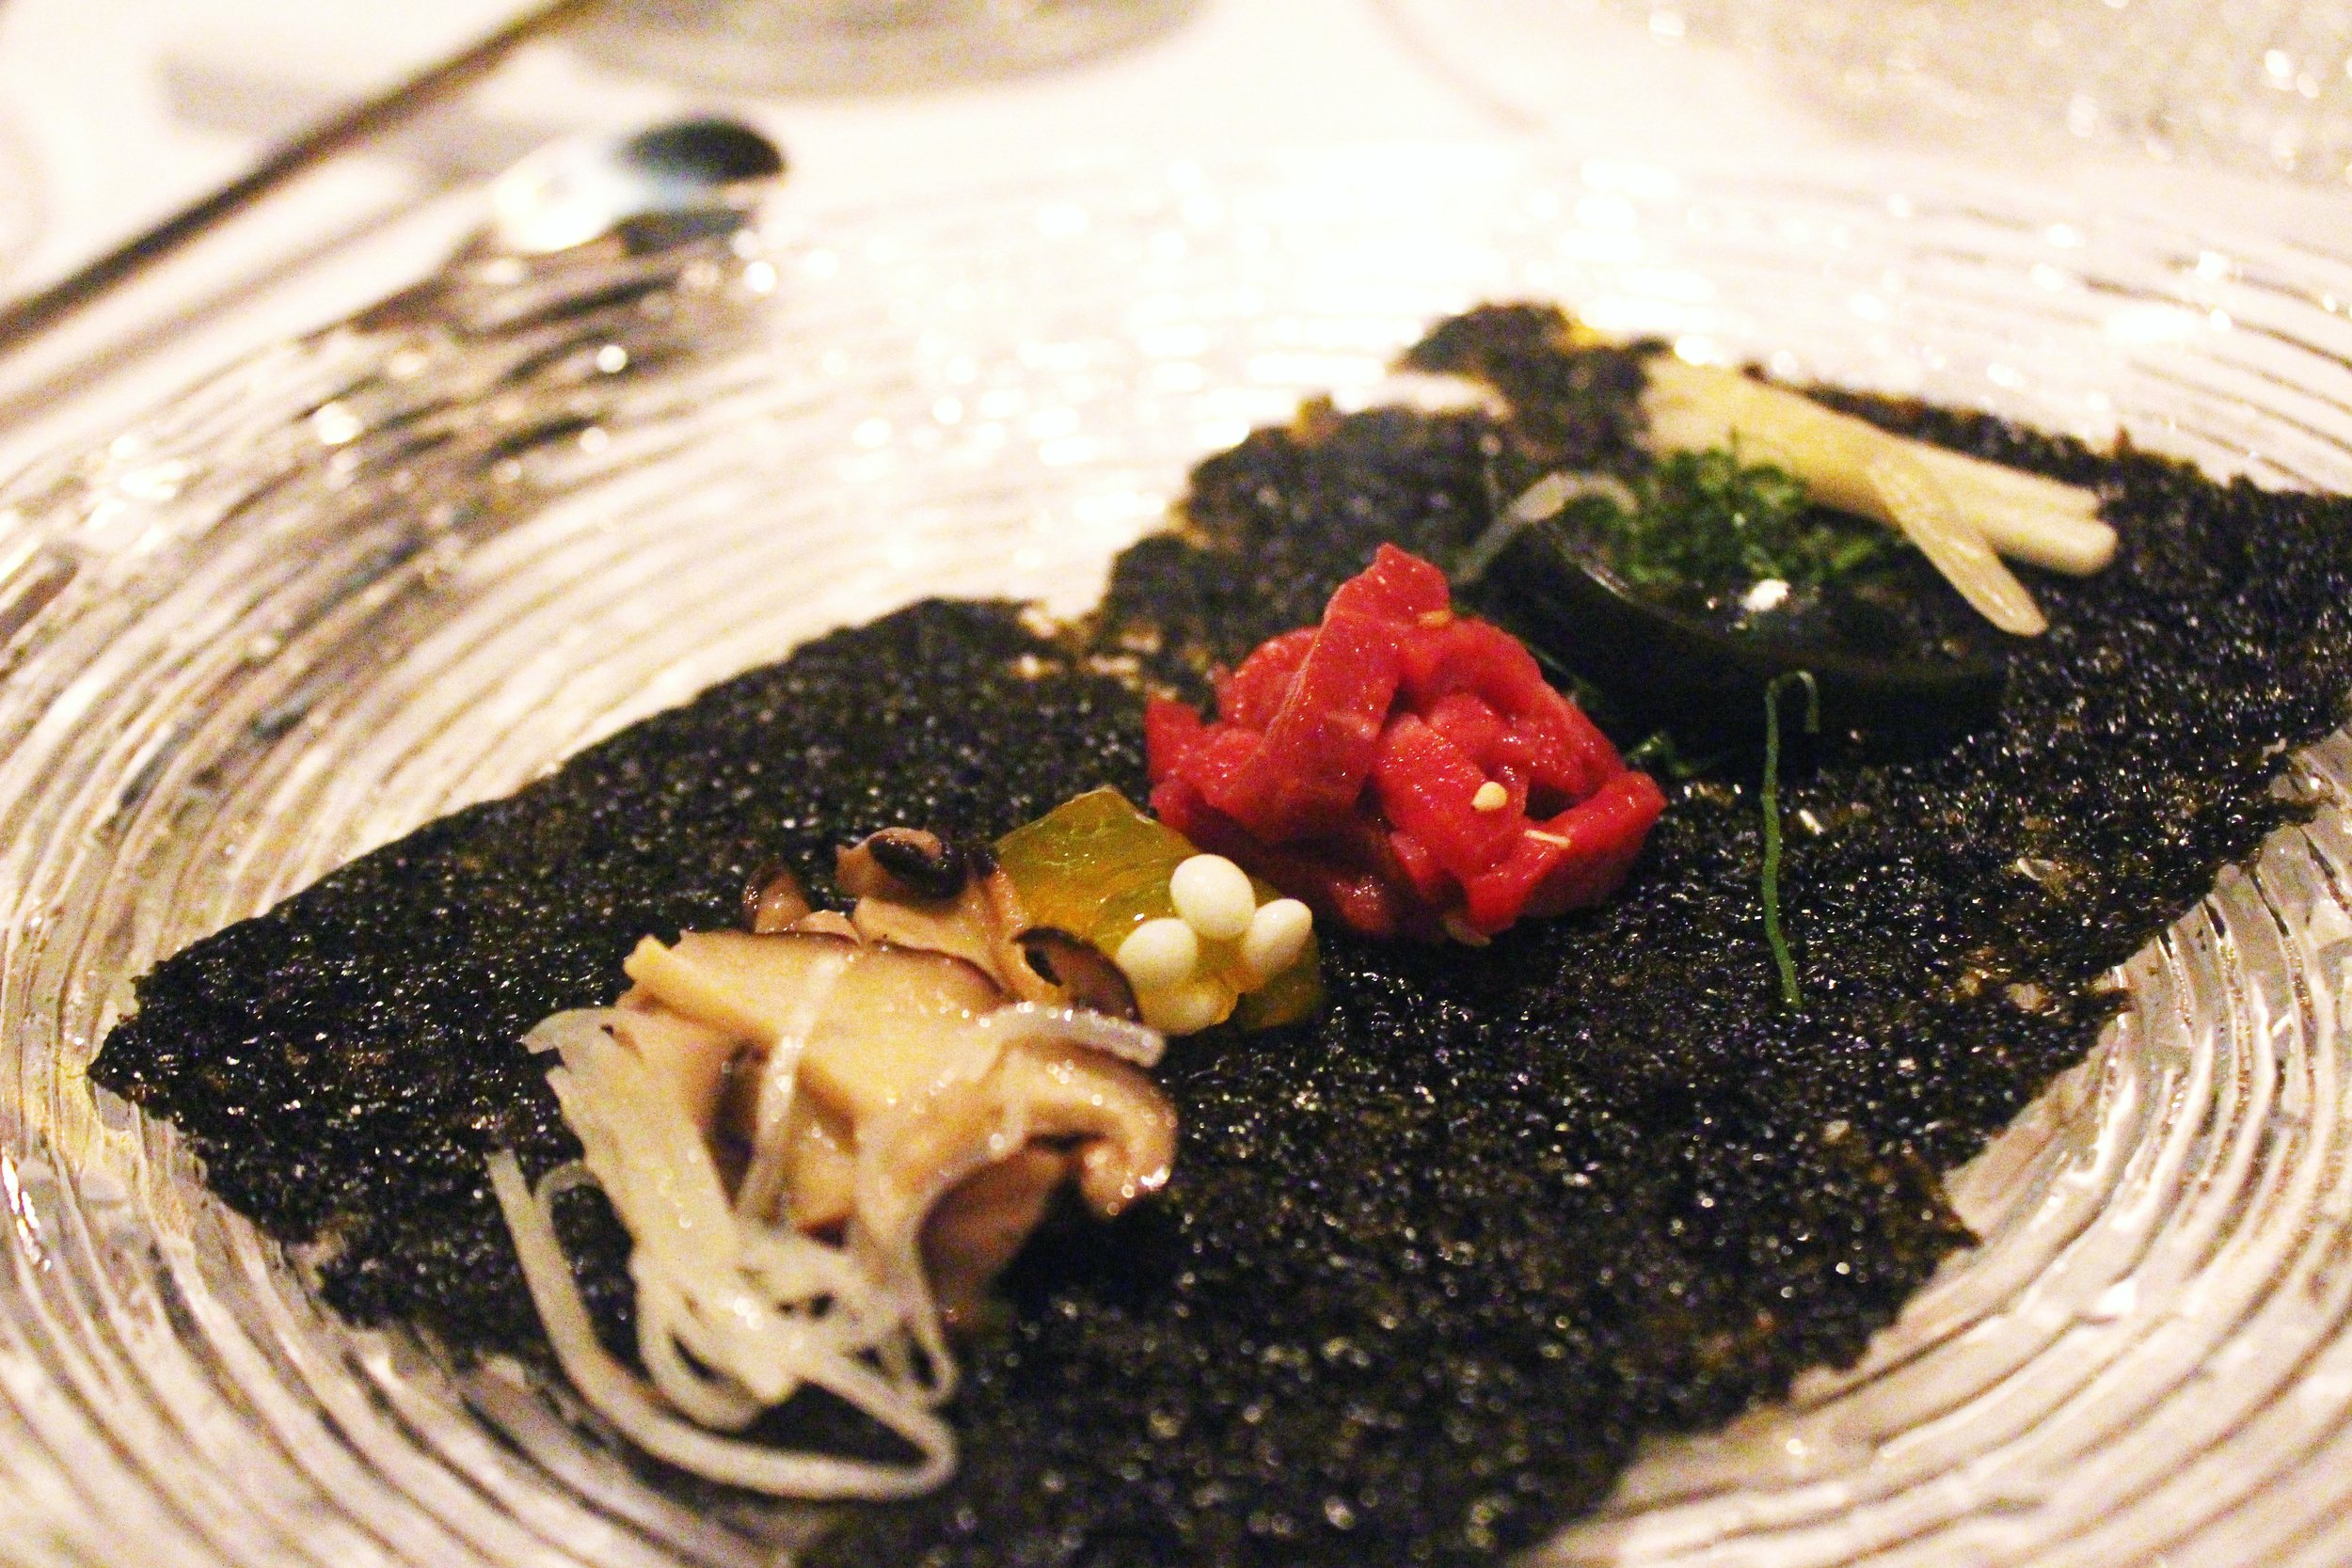 Gu Jeol Pan - Beef Tartare over Crispy Seaweed at Jungsik